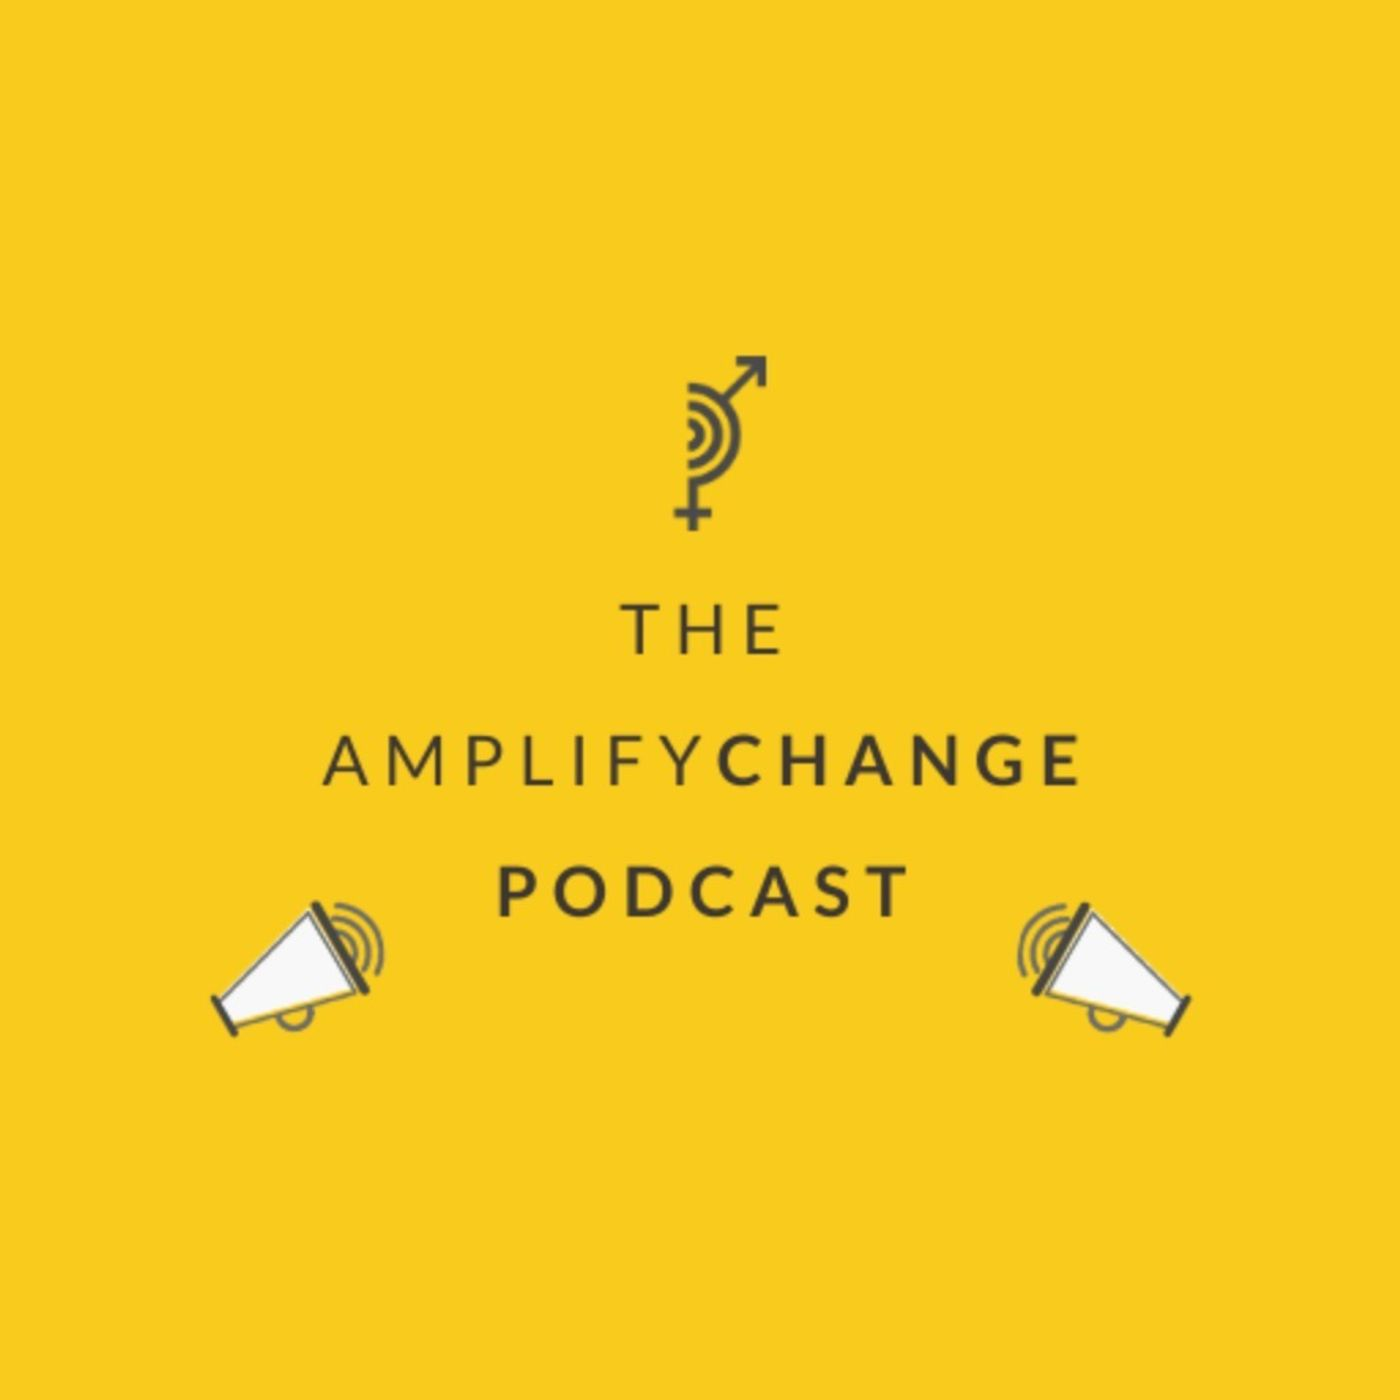 The AmplifyChange Podcast